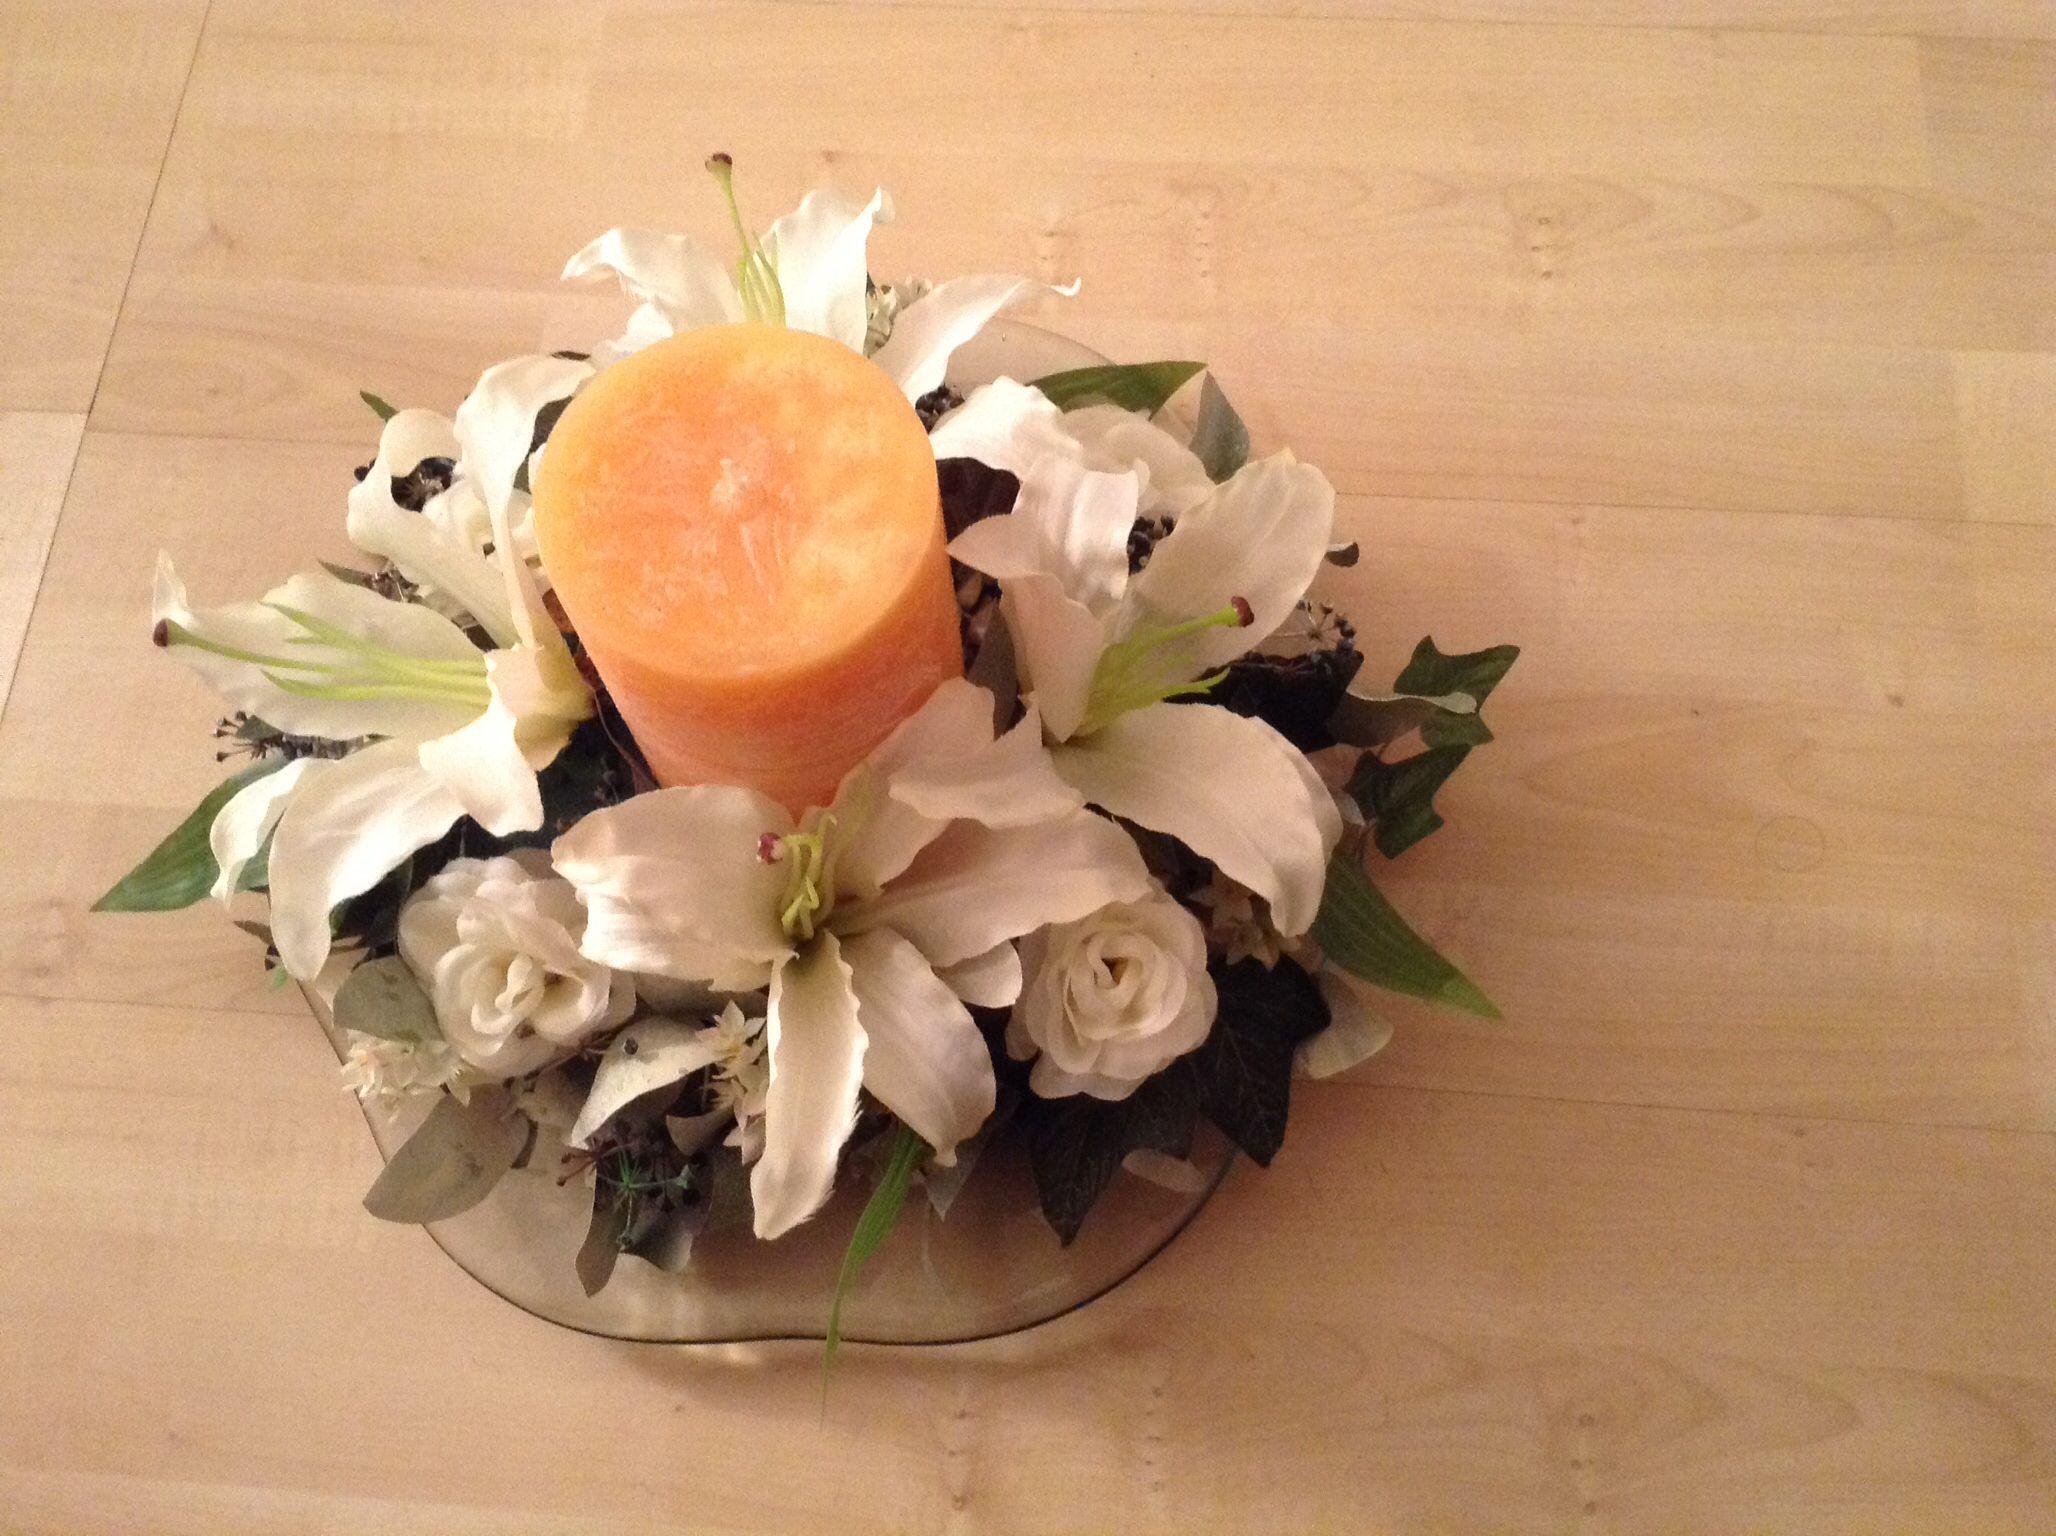 Centro de mesa con vela y flores blancas jacob bautizo - Centros de mesa con velas ...